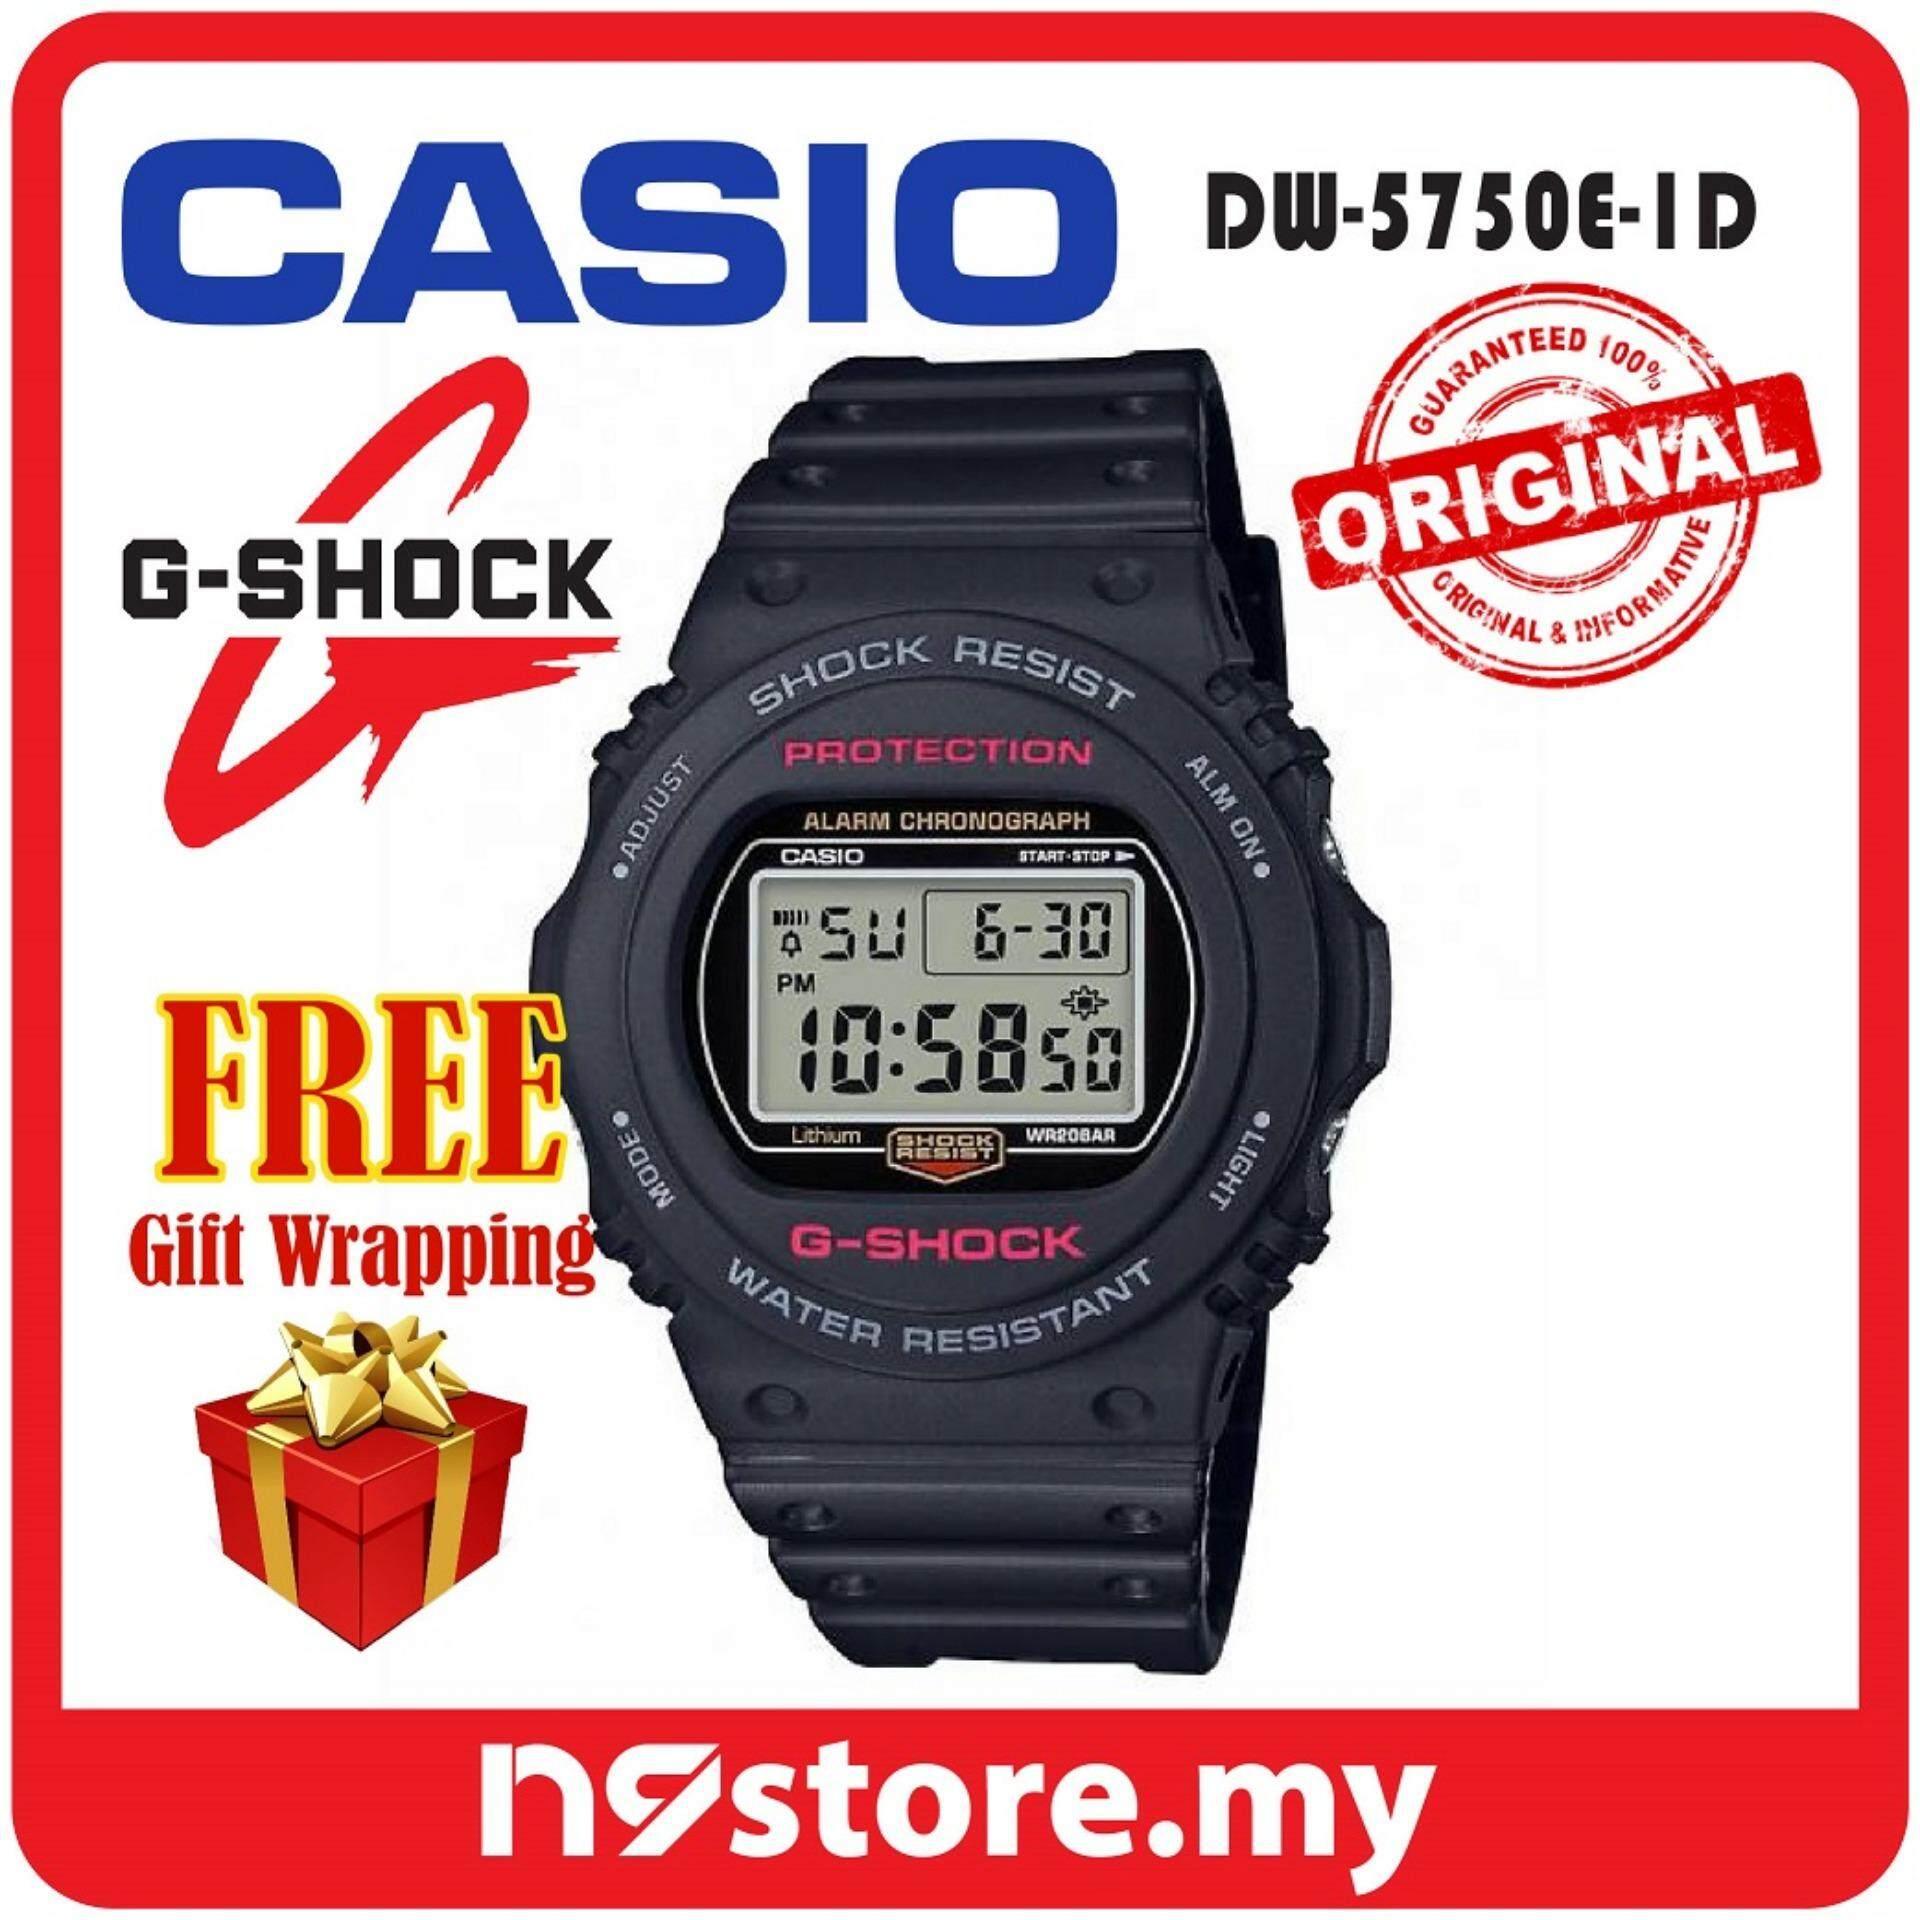 Casio G-Shock DW-5750E-1 Digital Back-To-Original 2018 Version Sports Watch